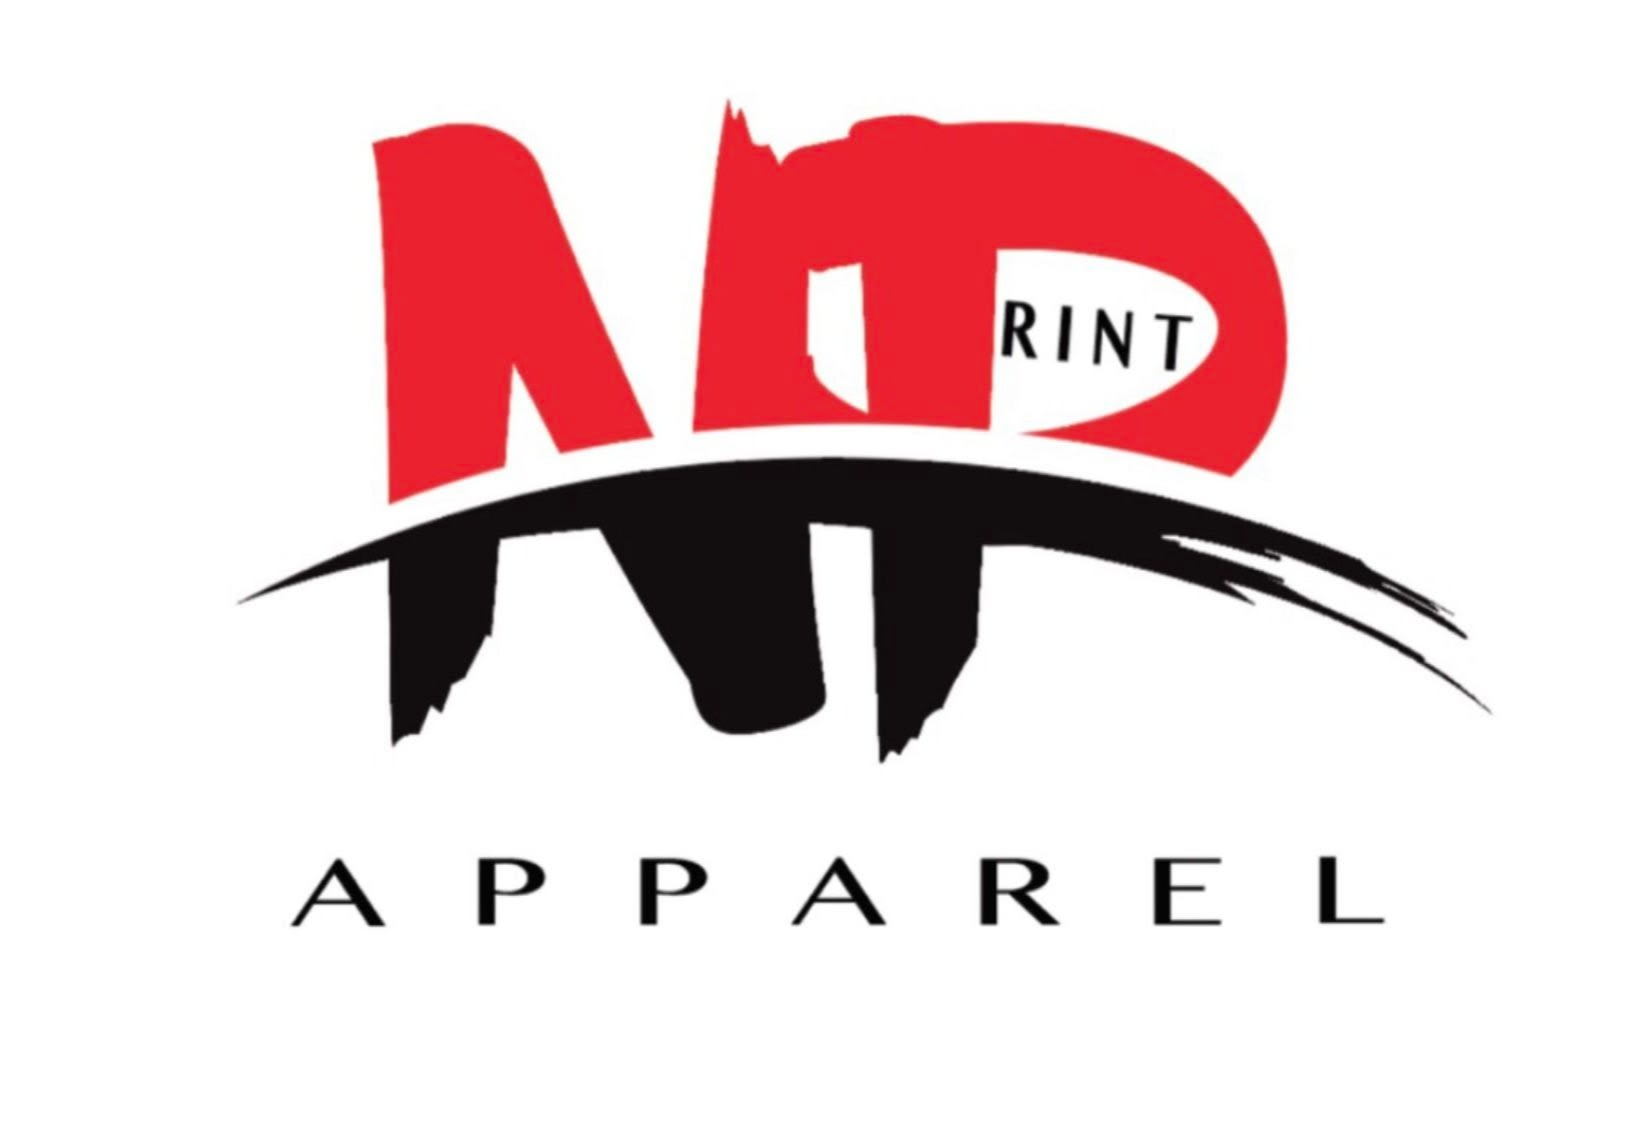 NPrint Apparel